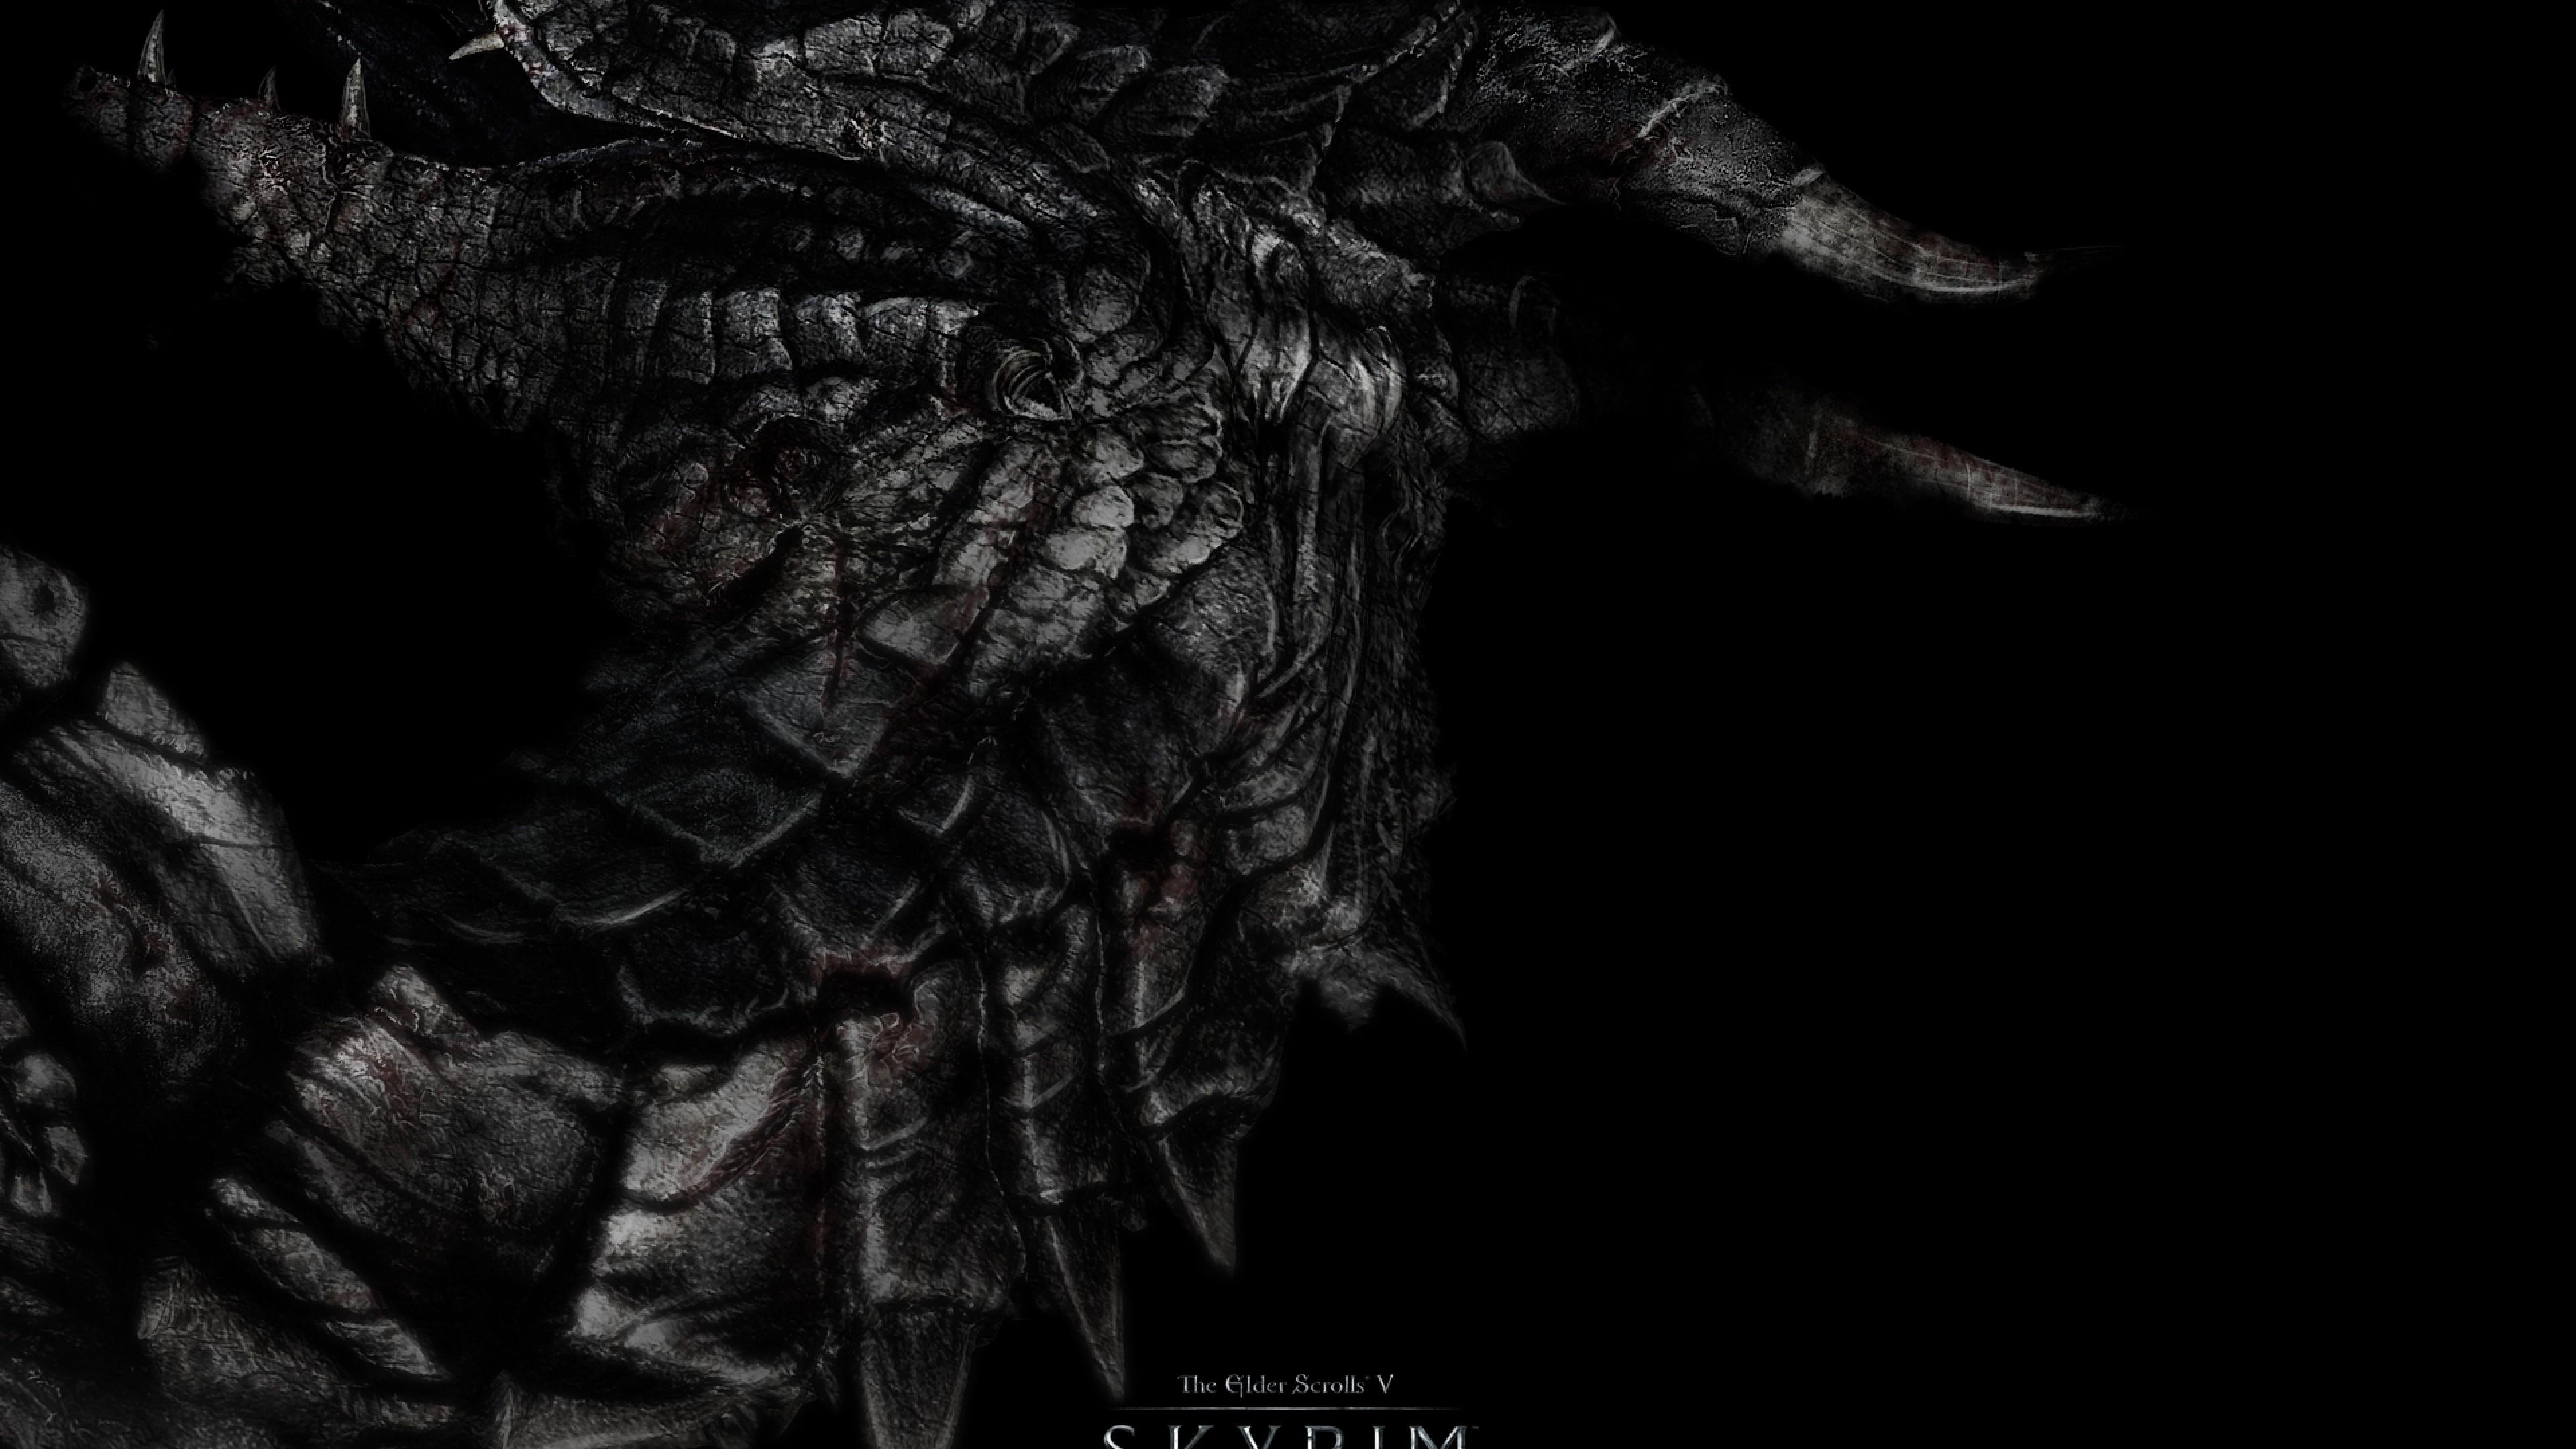 Skyrim, The elder scrolls v skyrim Wallpaper, Background 4K Ultra HD .